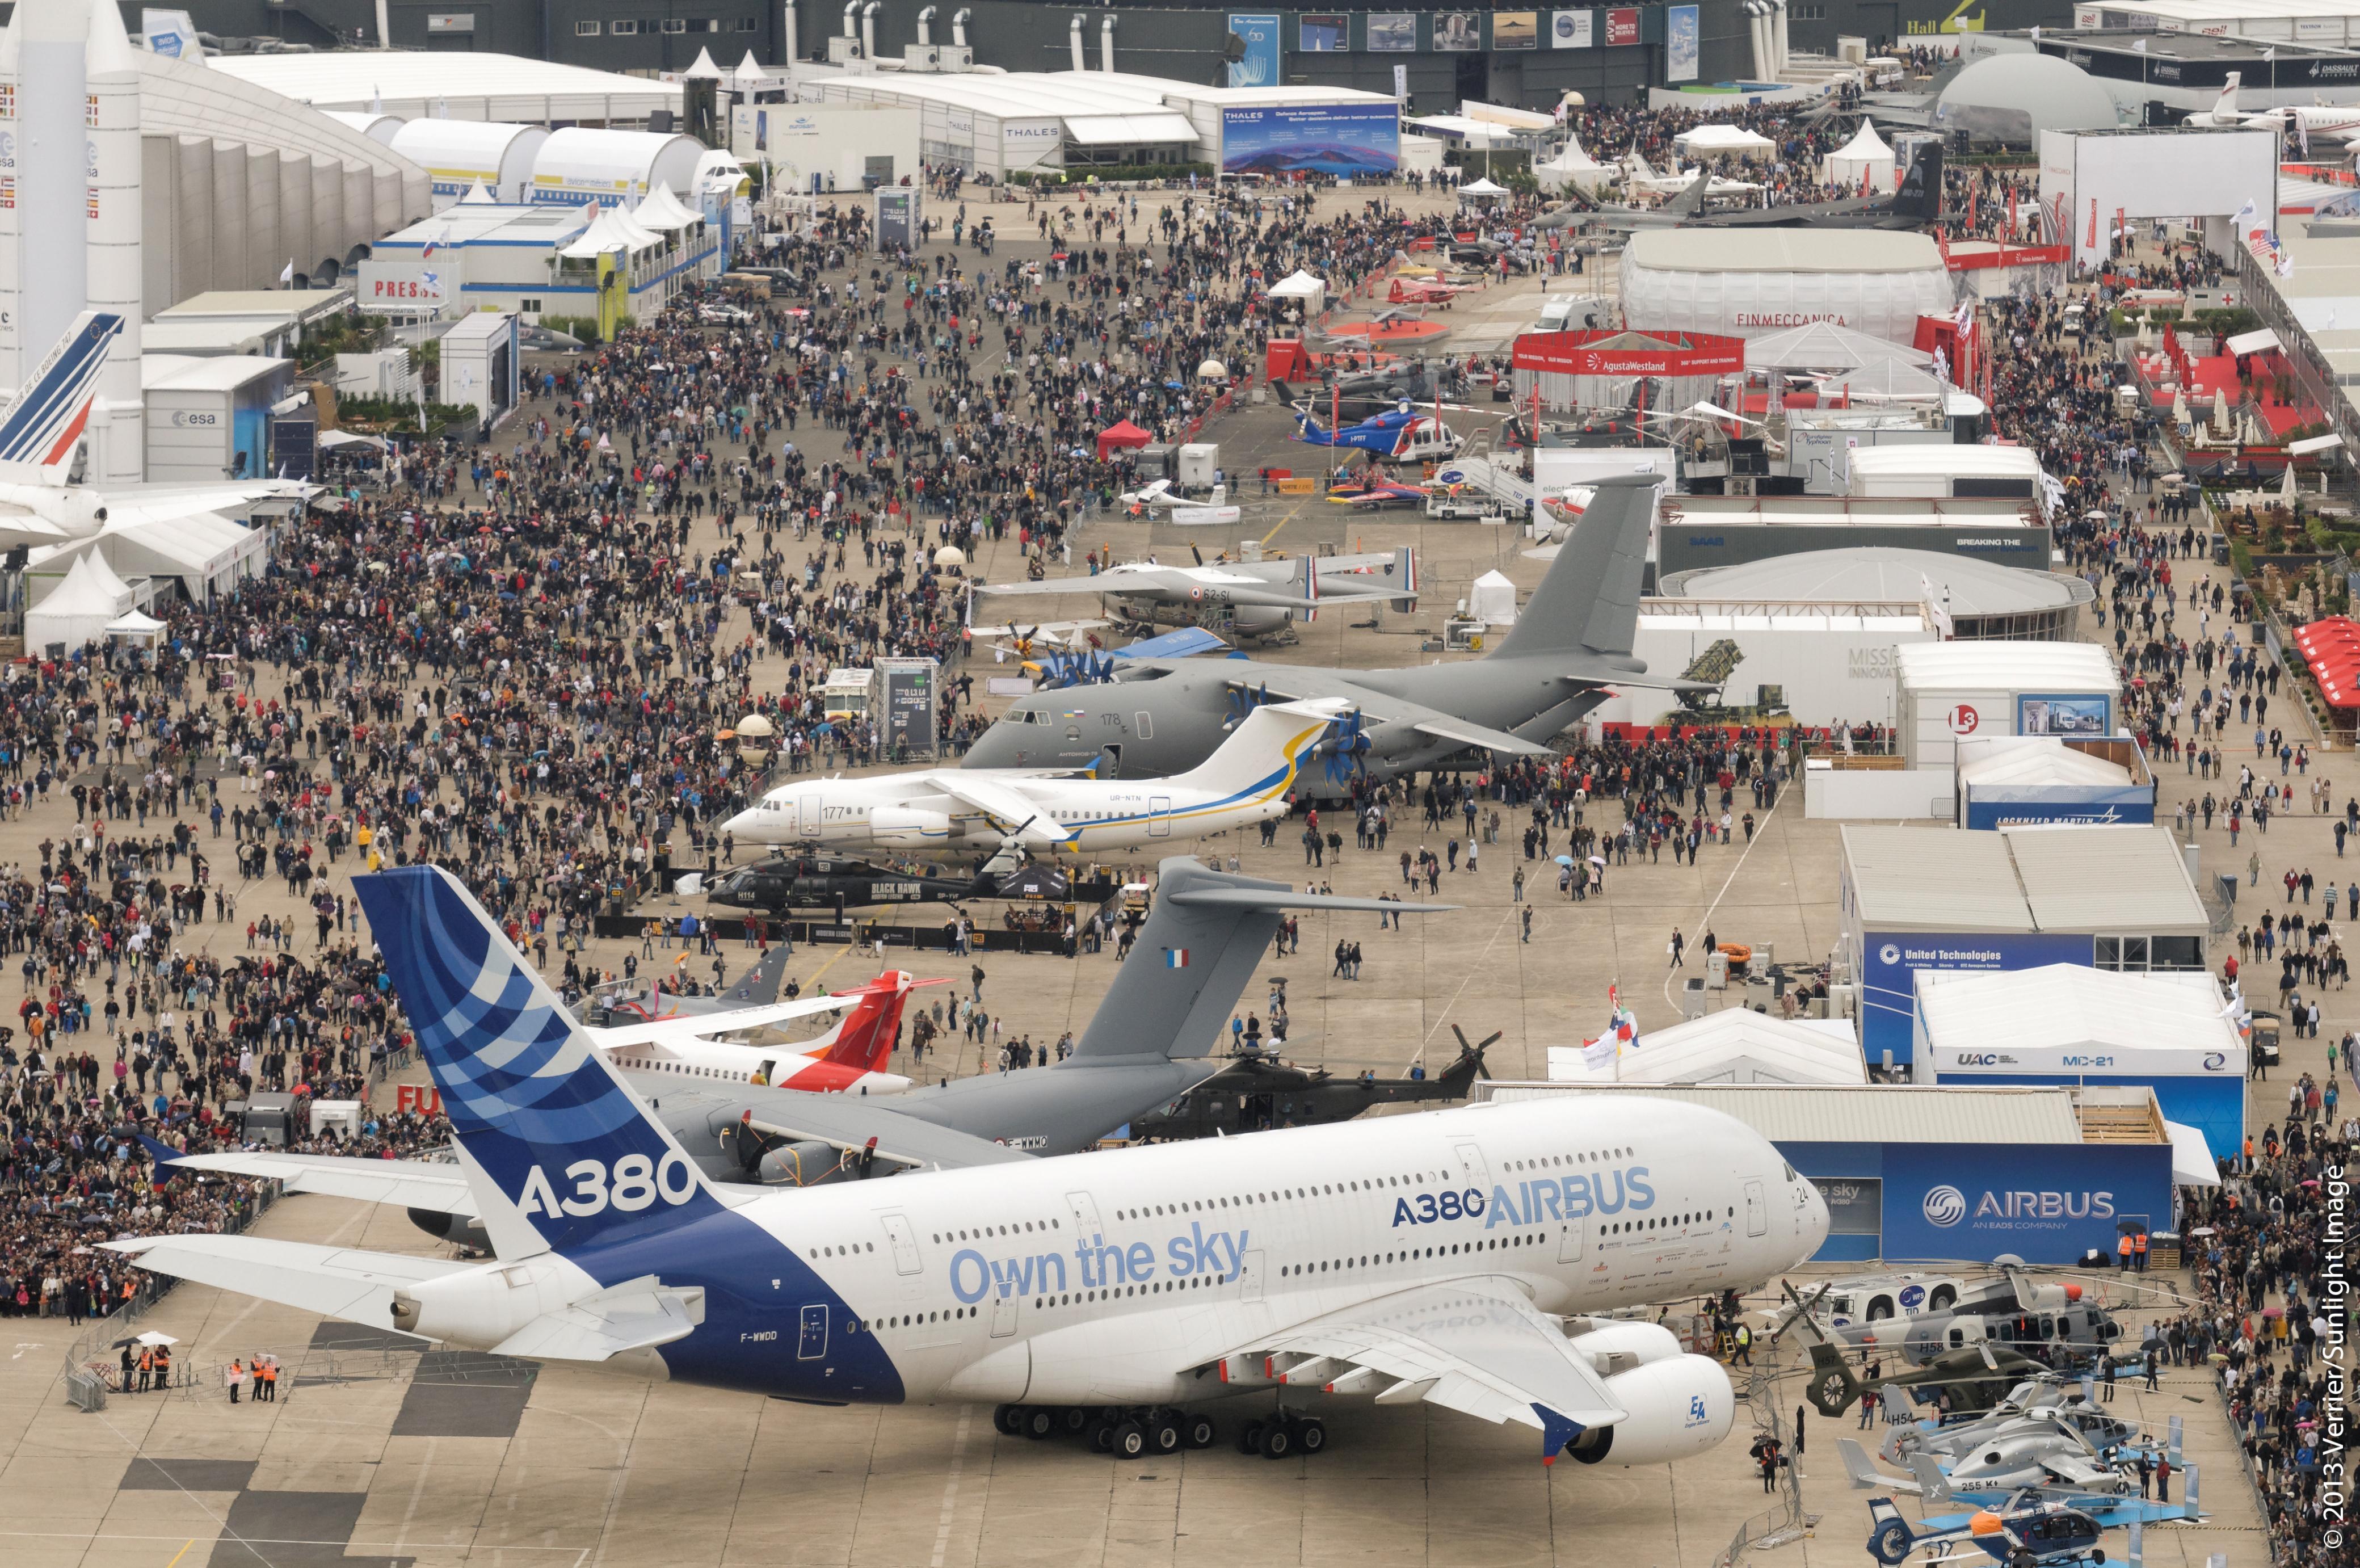 Boeing and airbus battle it out at paris air show for Air show paris 2015